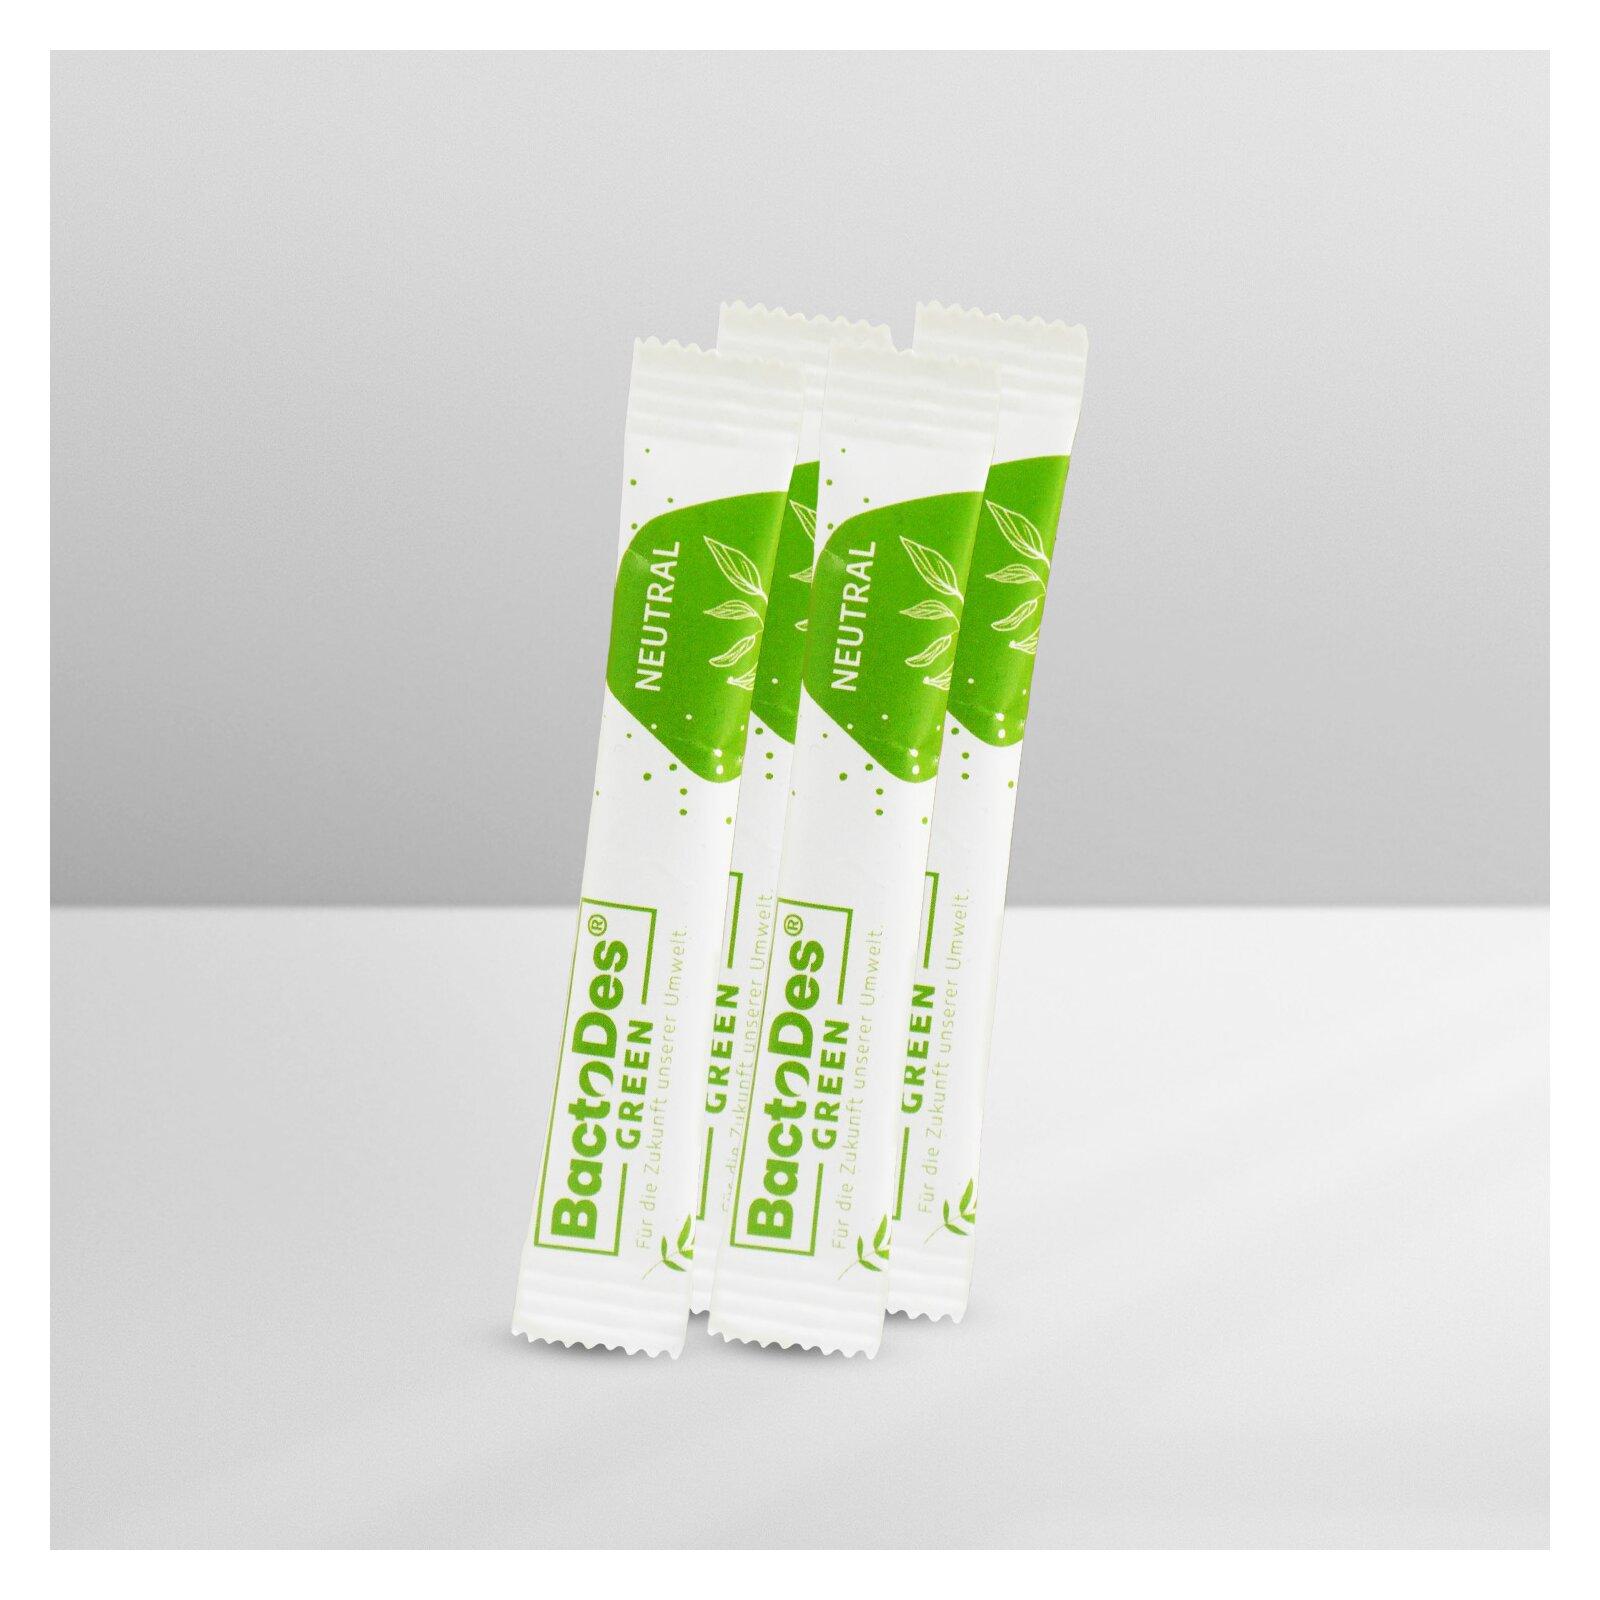 BactoDes(R) Green Neutral Stick 4 Sticks Nachfüllset